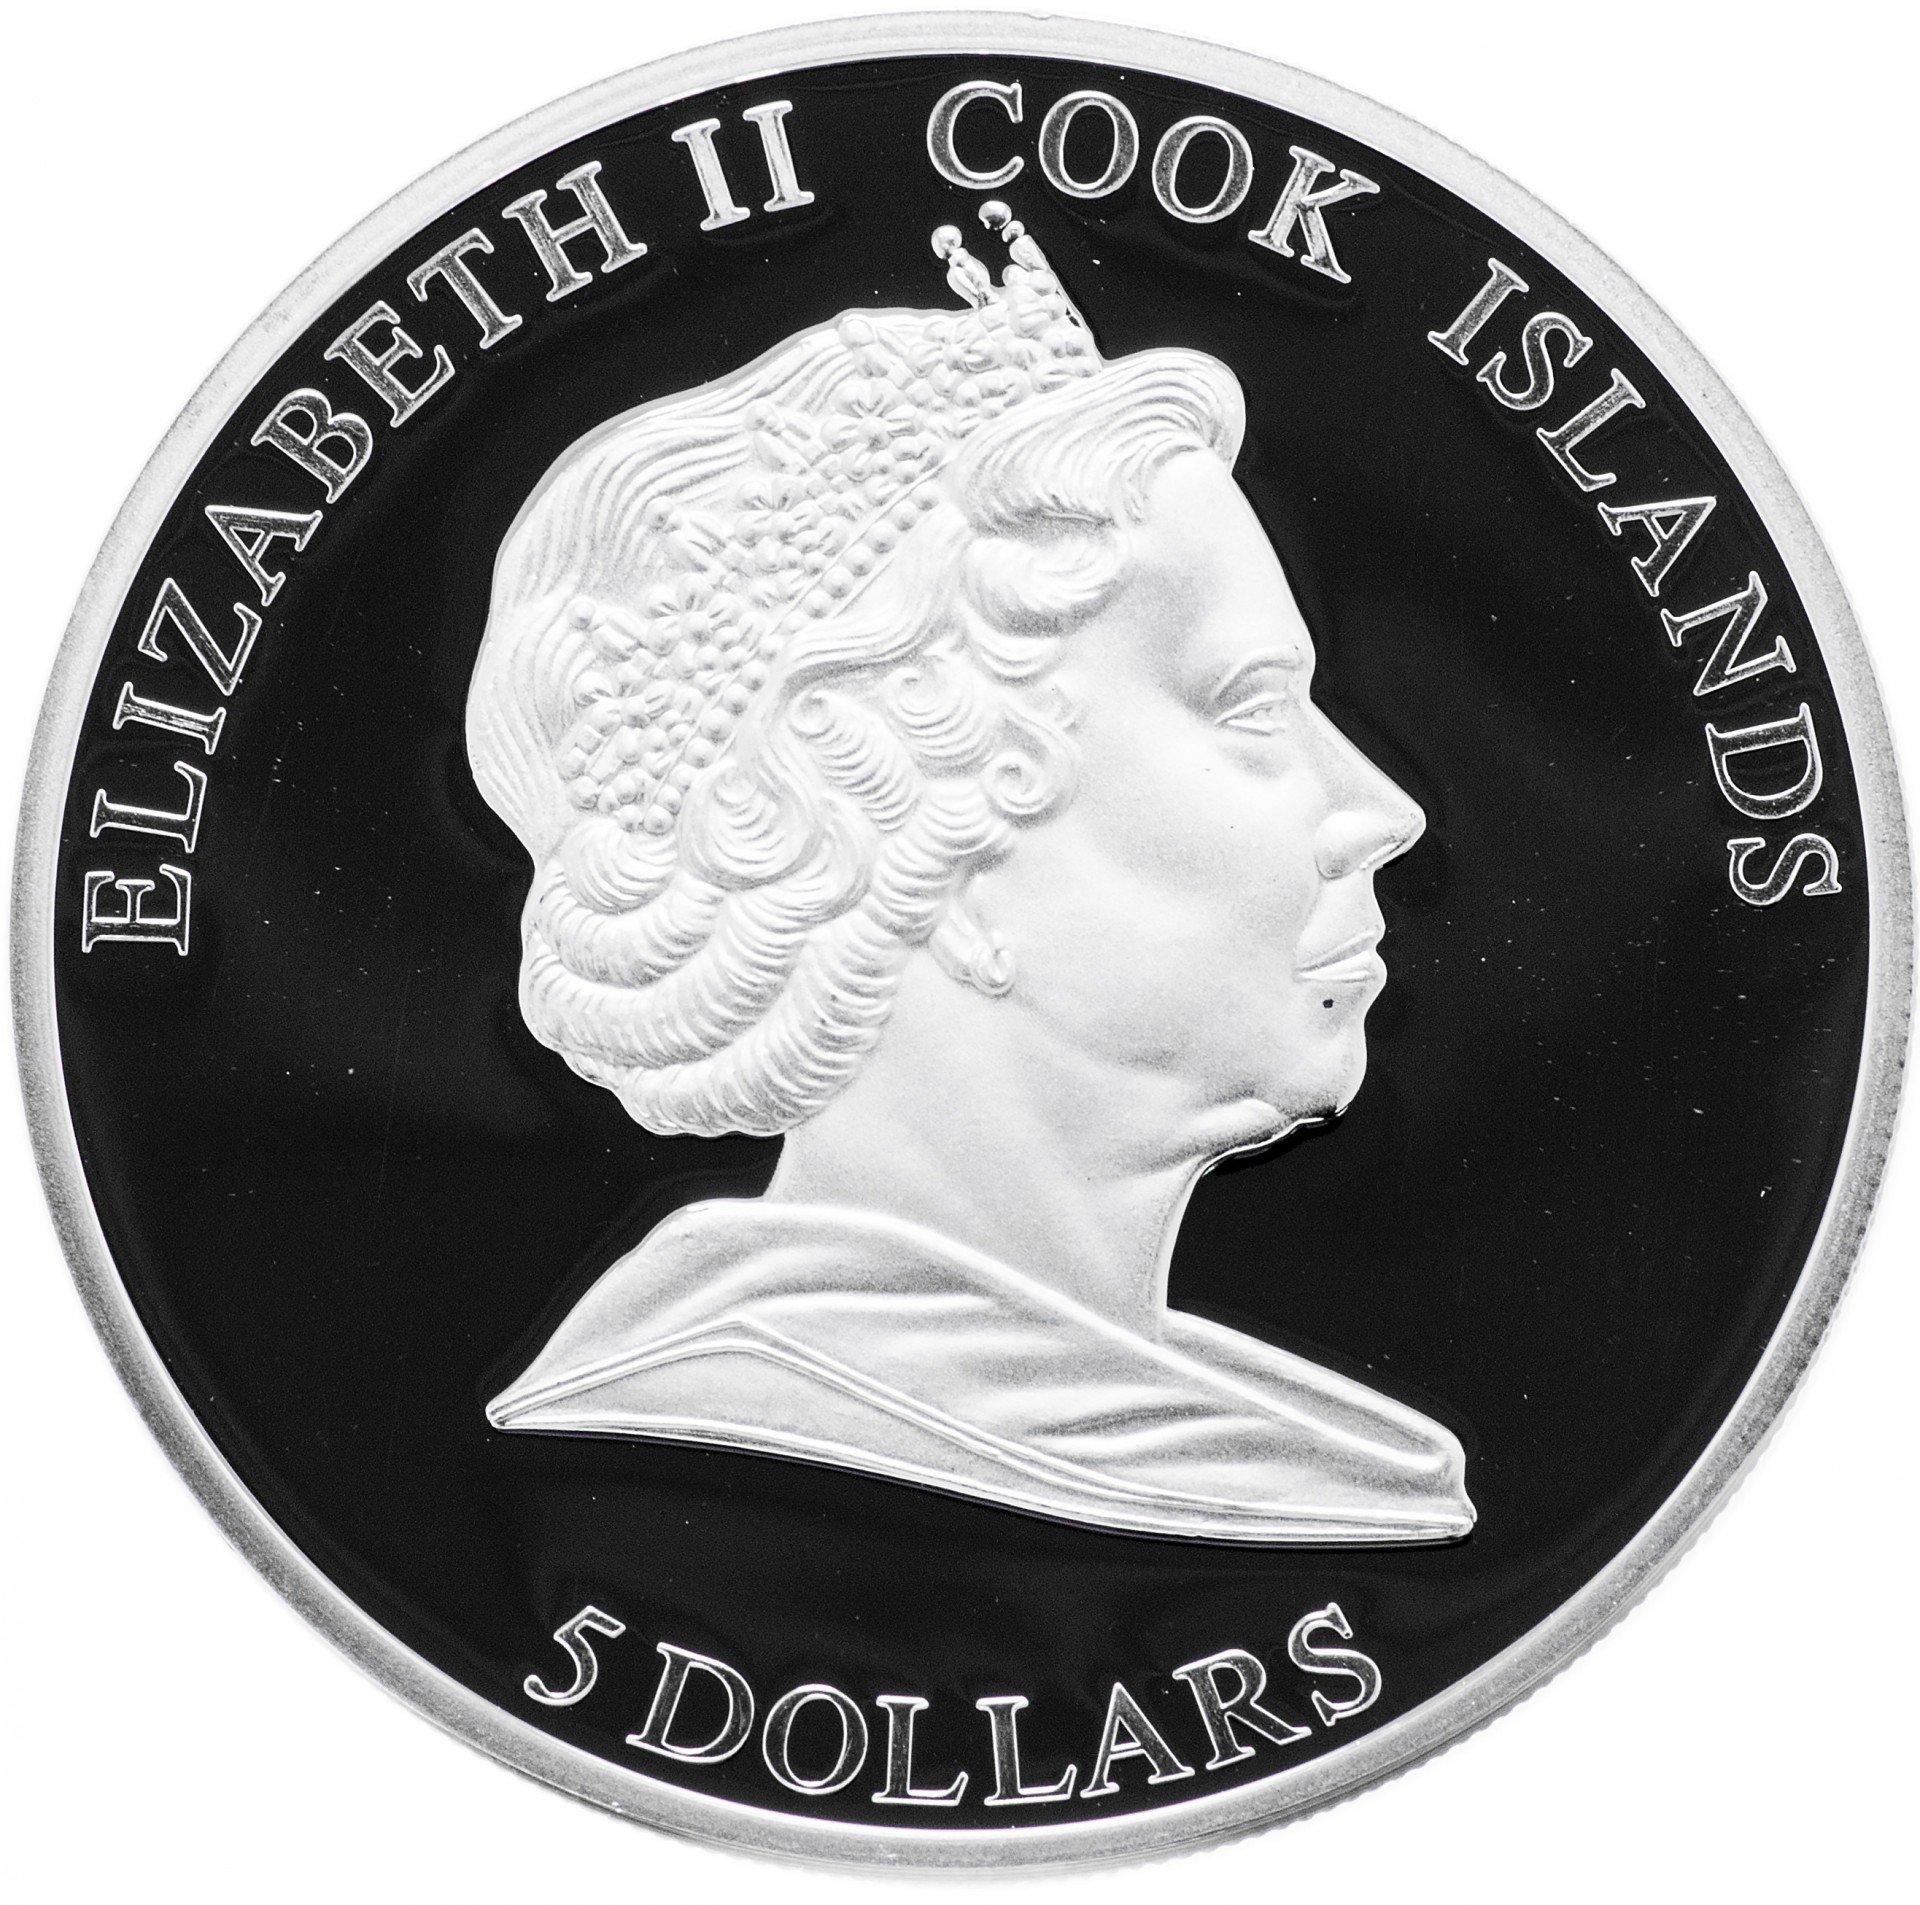 Elizabeth 2 jcnhjdf rerf z [jxe ,snm c nj,jq 2010 какие монеты россии выпустят в 2017 году